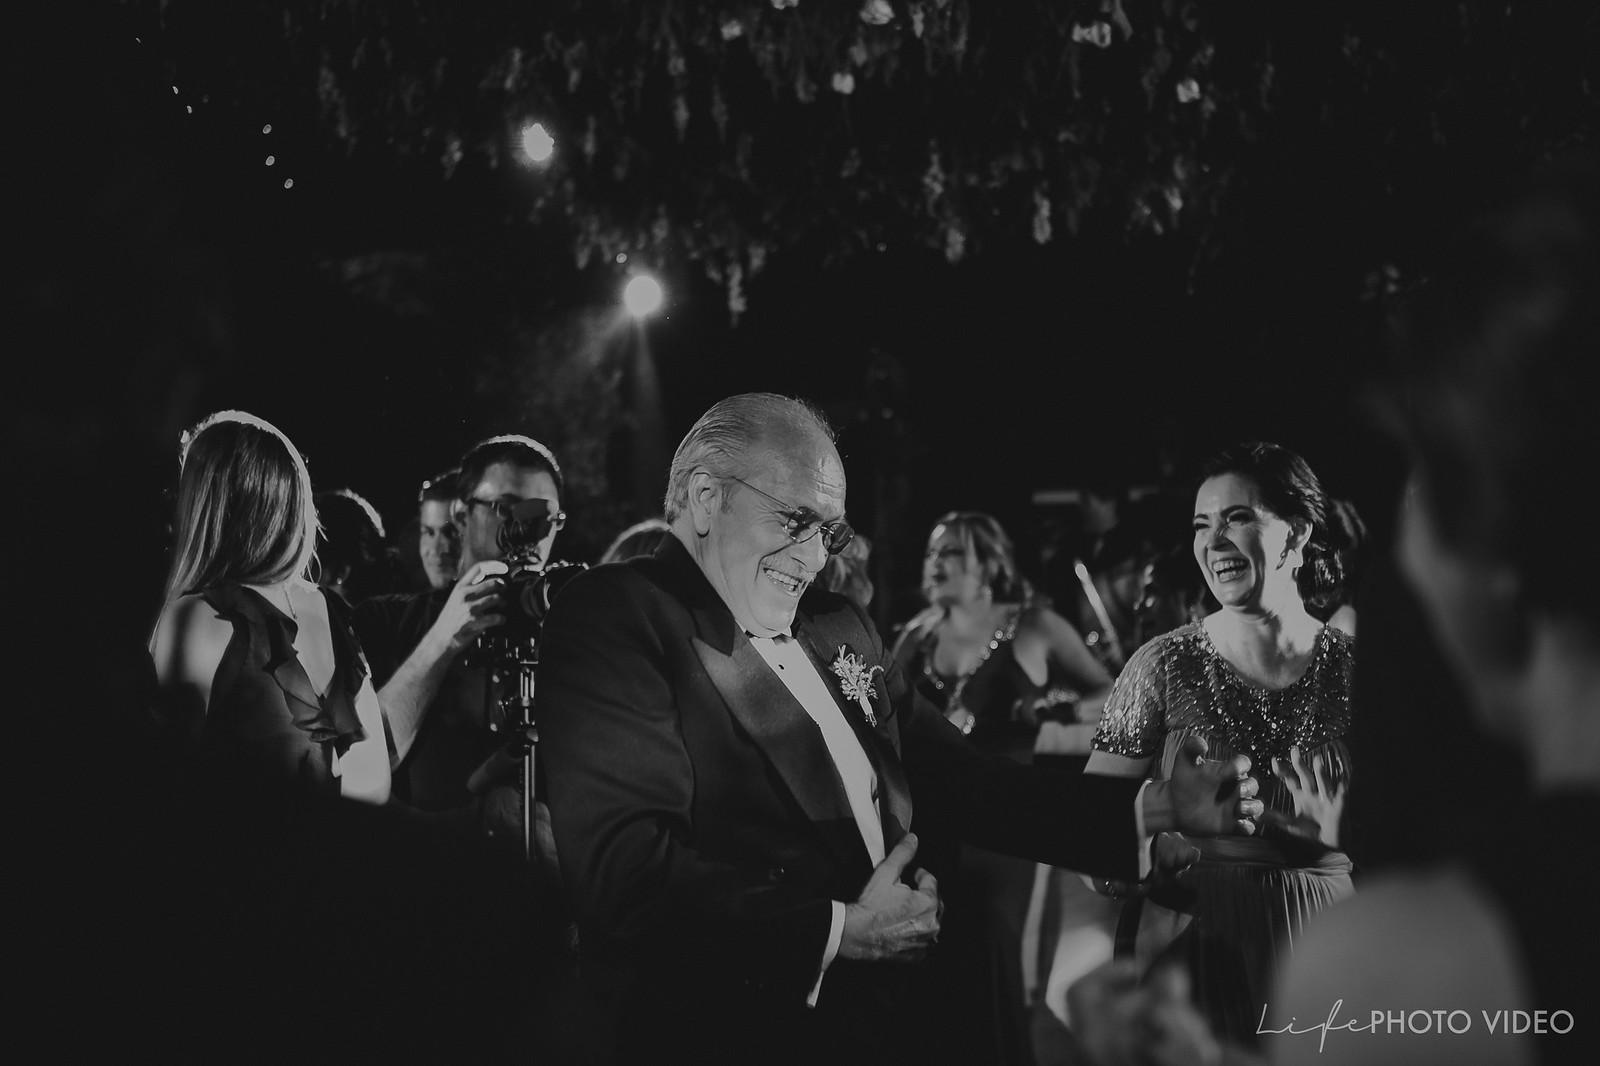 LifePhotoVideo_Boda_Guanajuato_Wedding_0066